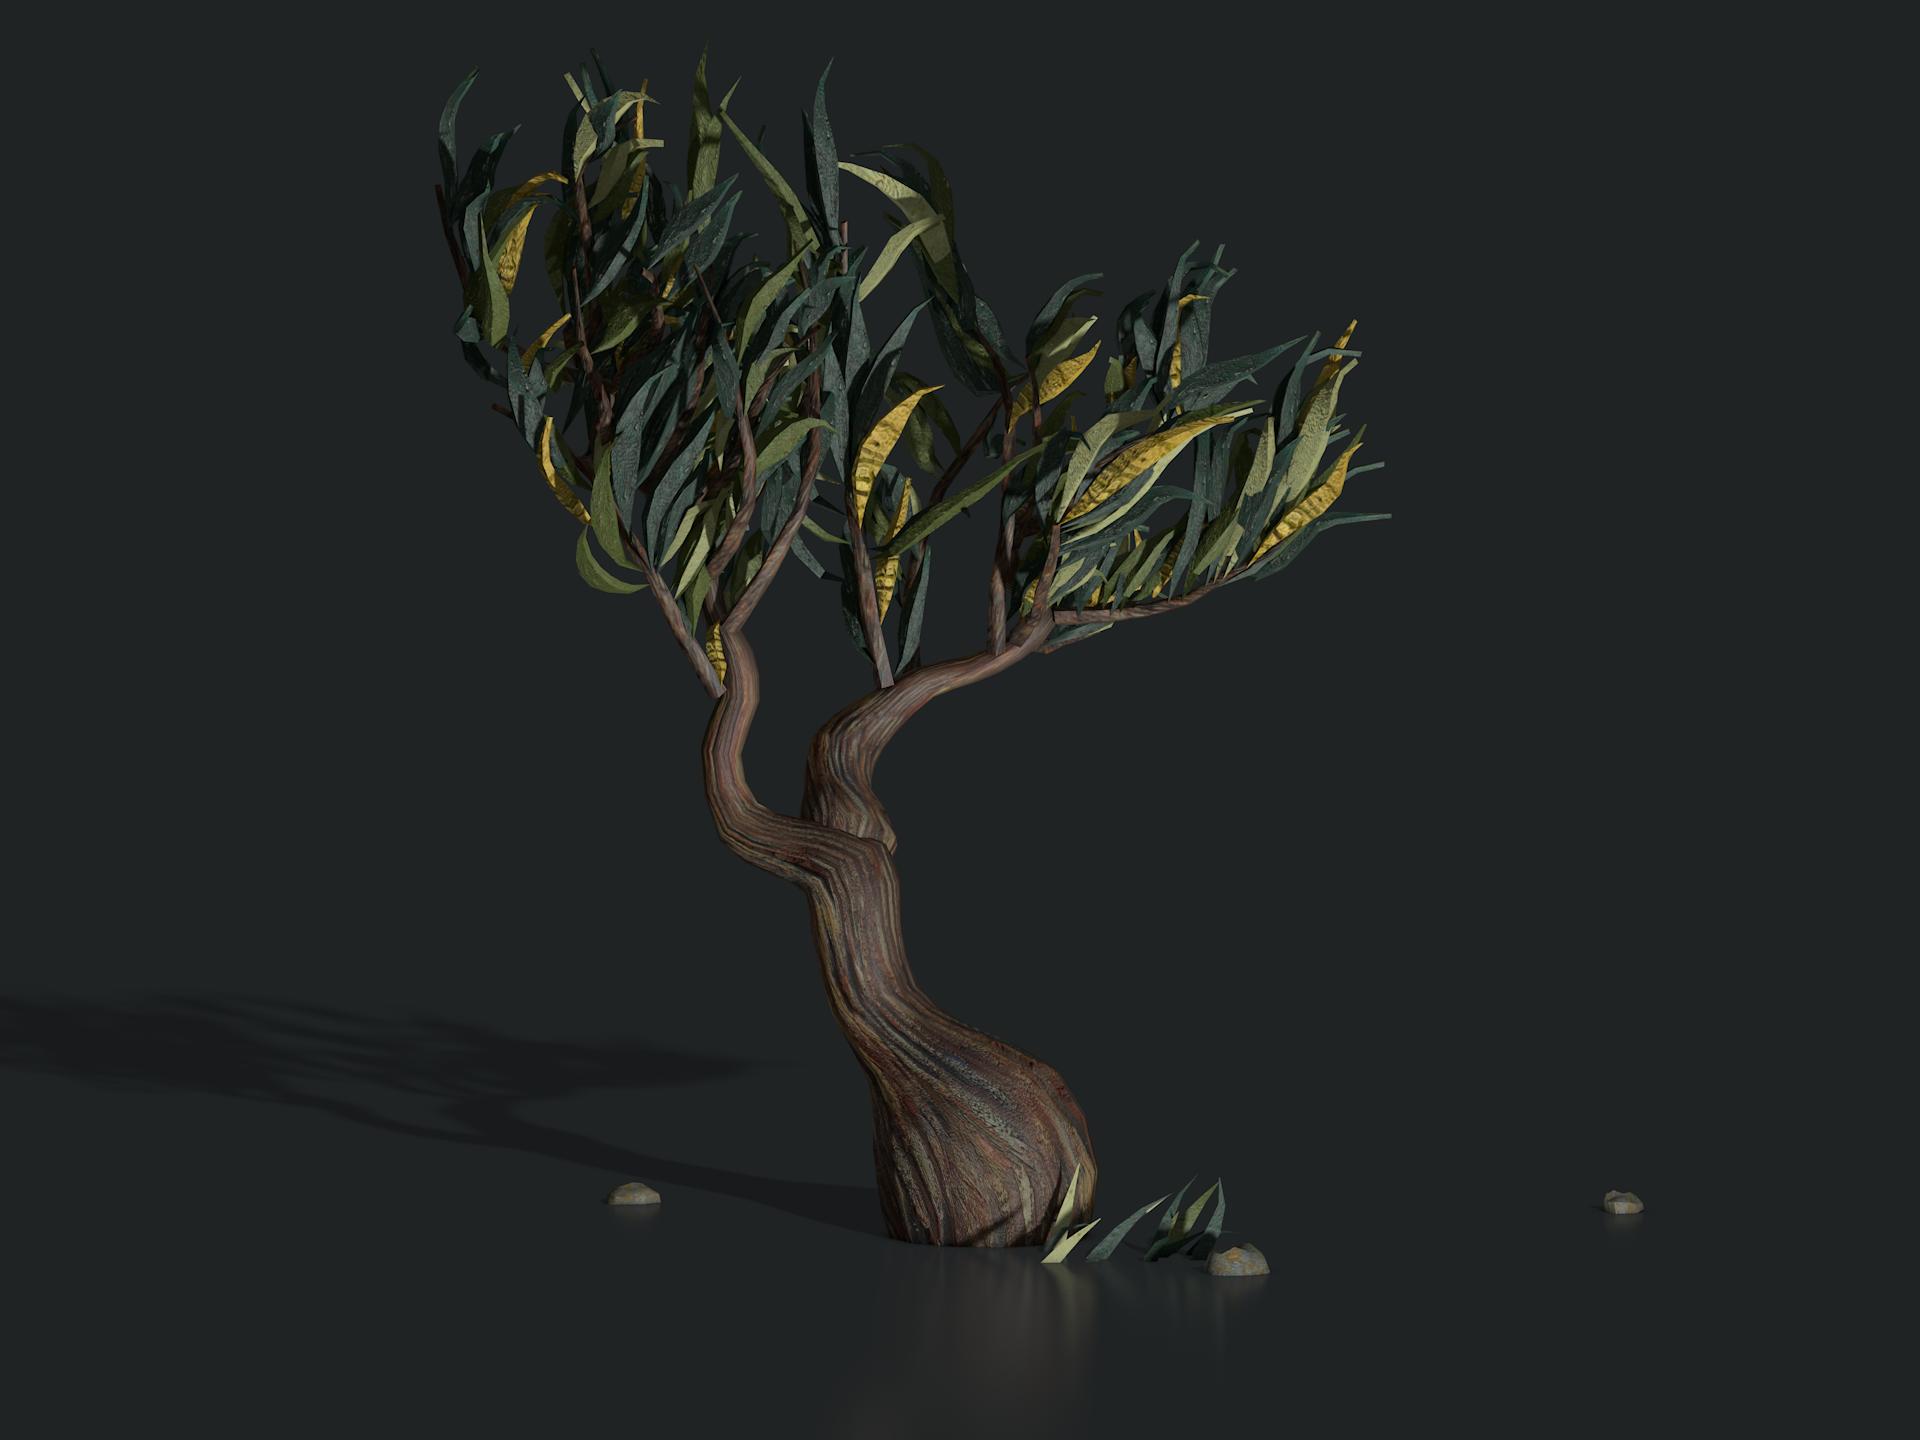 plants_saint_remy_tree1305.png